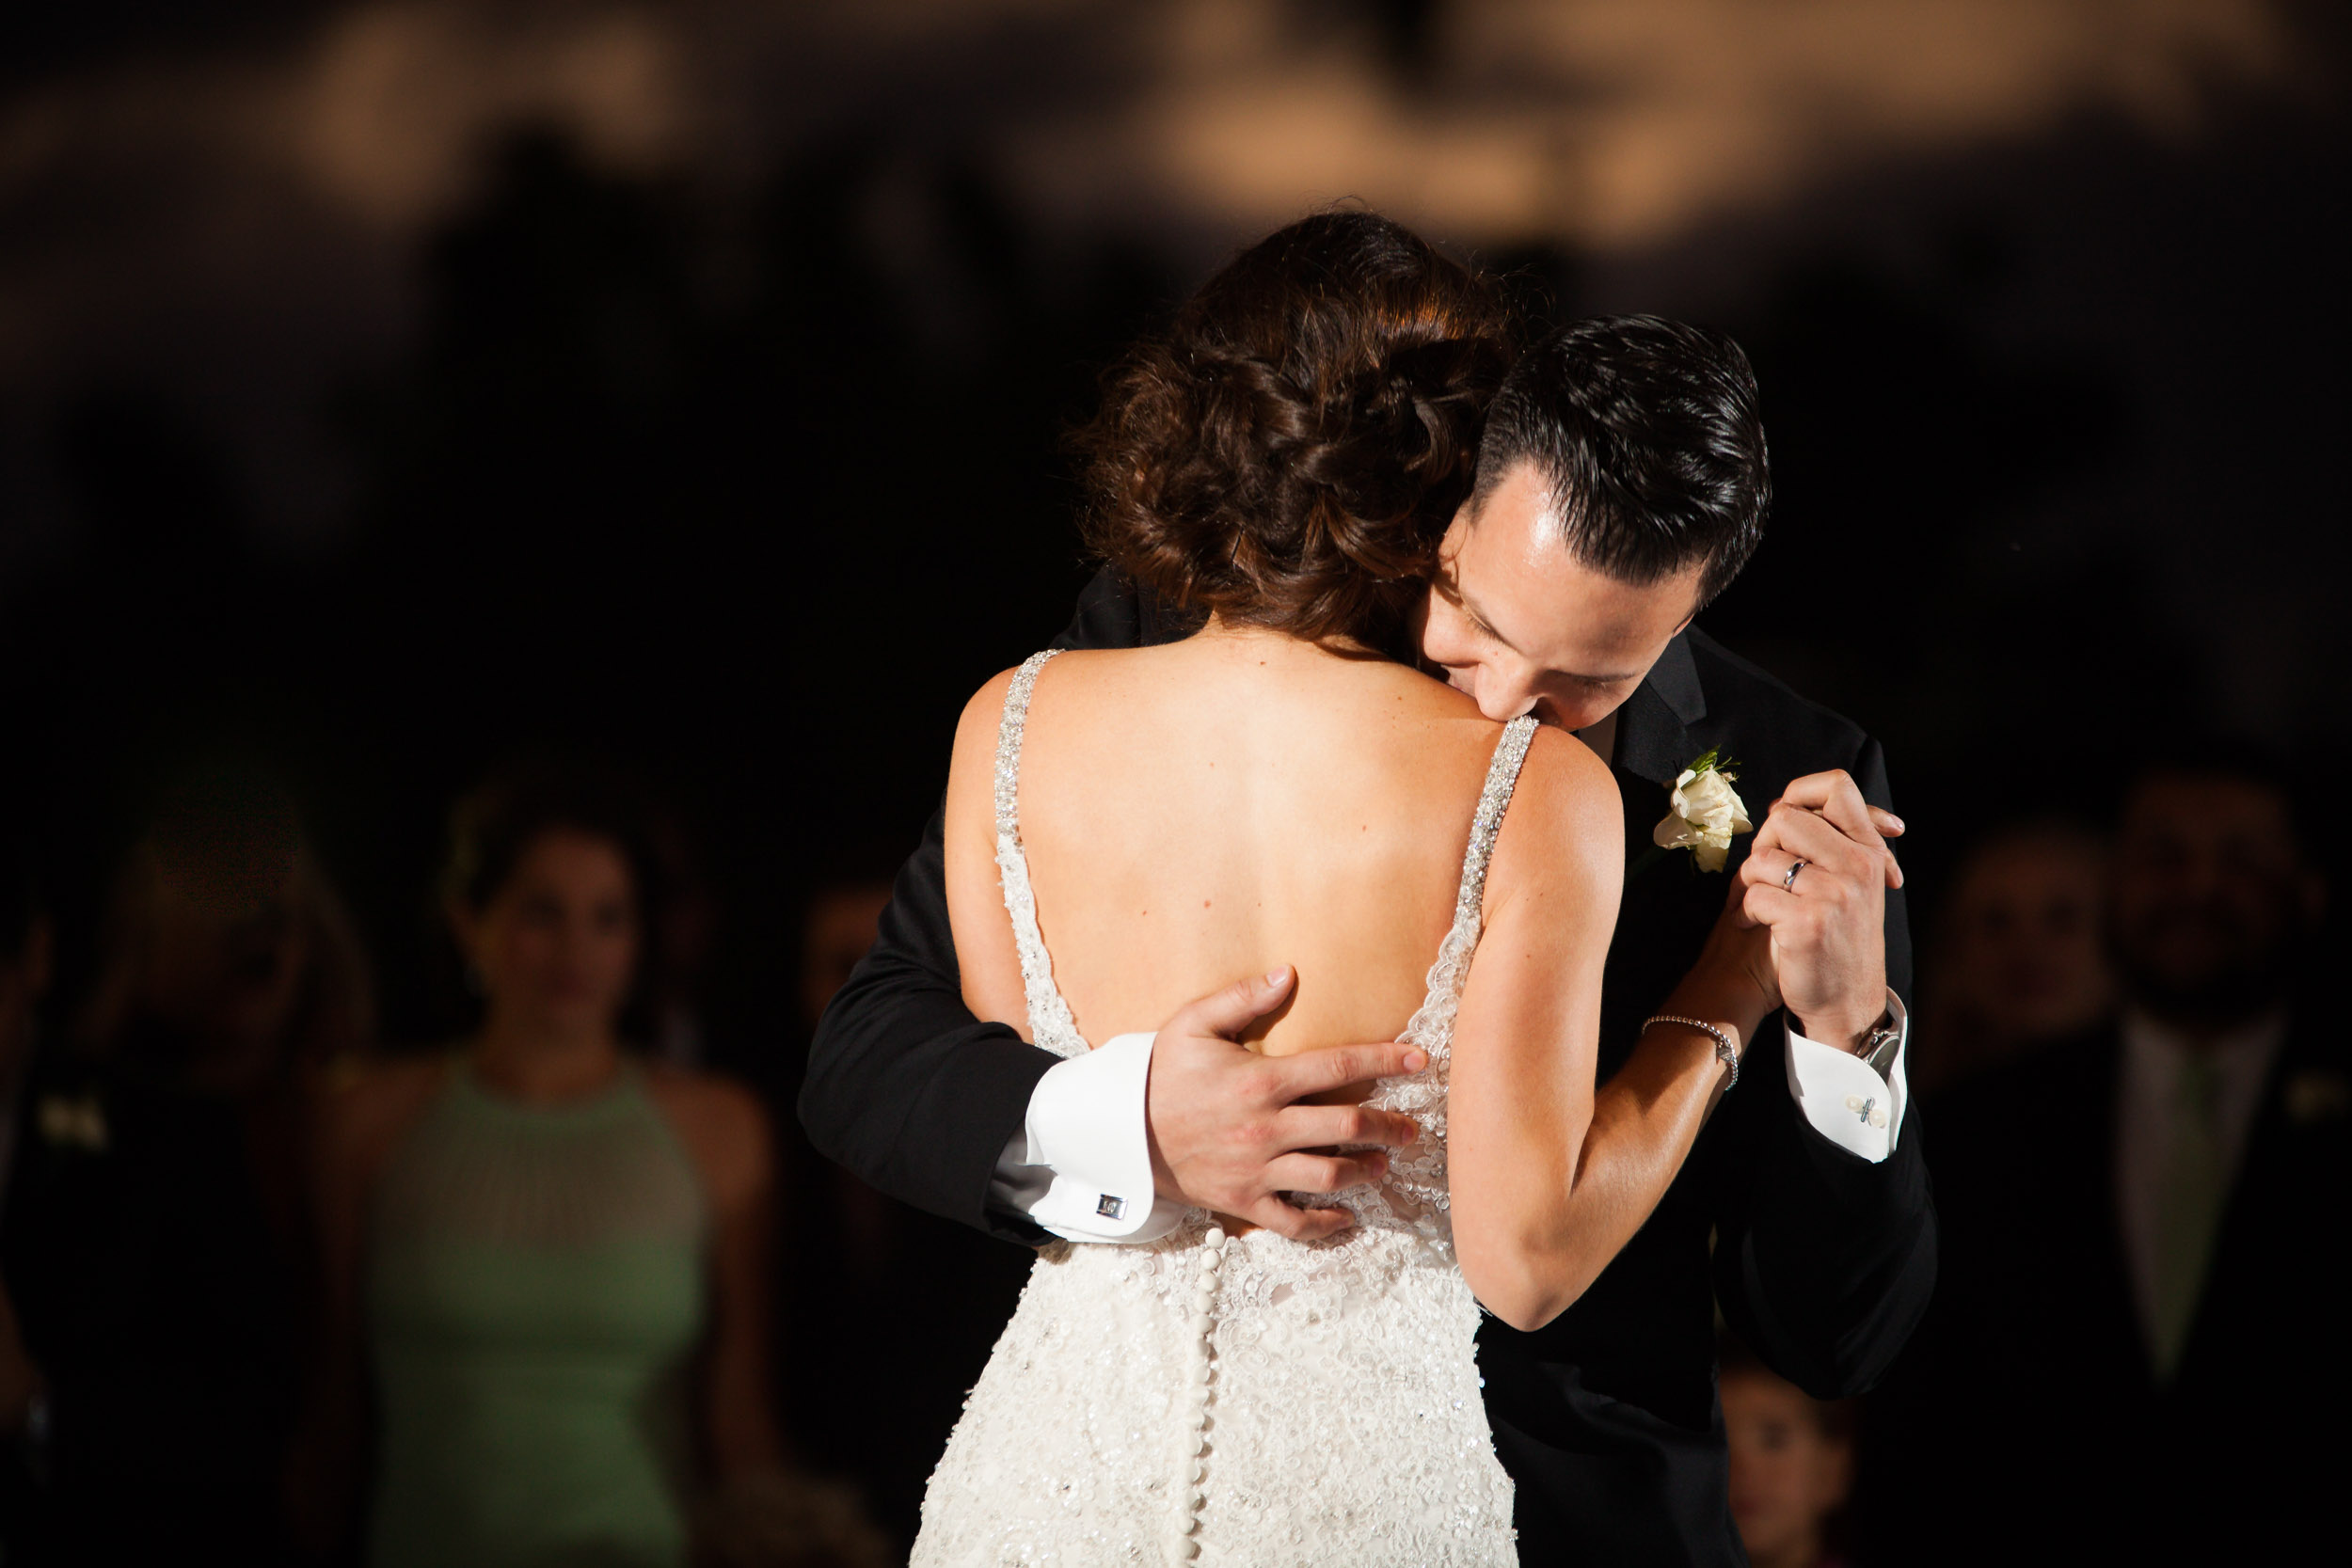 Flordia-Wedding-Photography-56.jpg